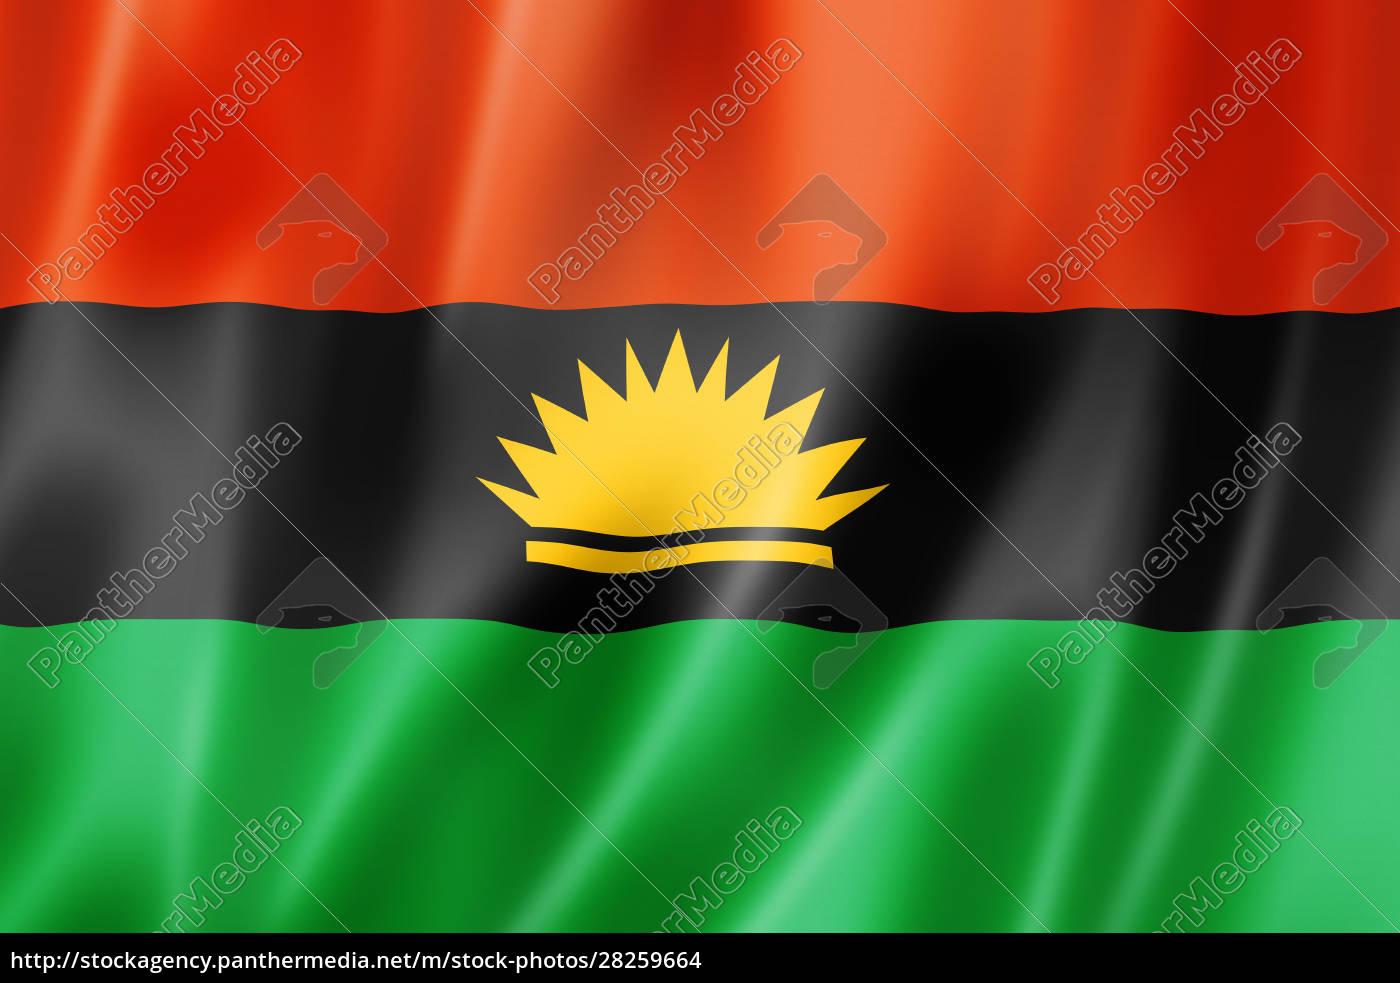 biafra, ethnic, flag, , africa - 28259664